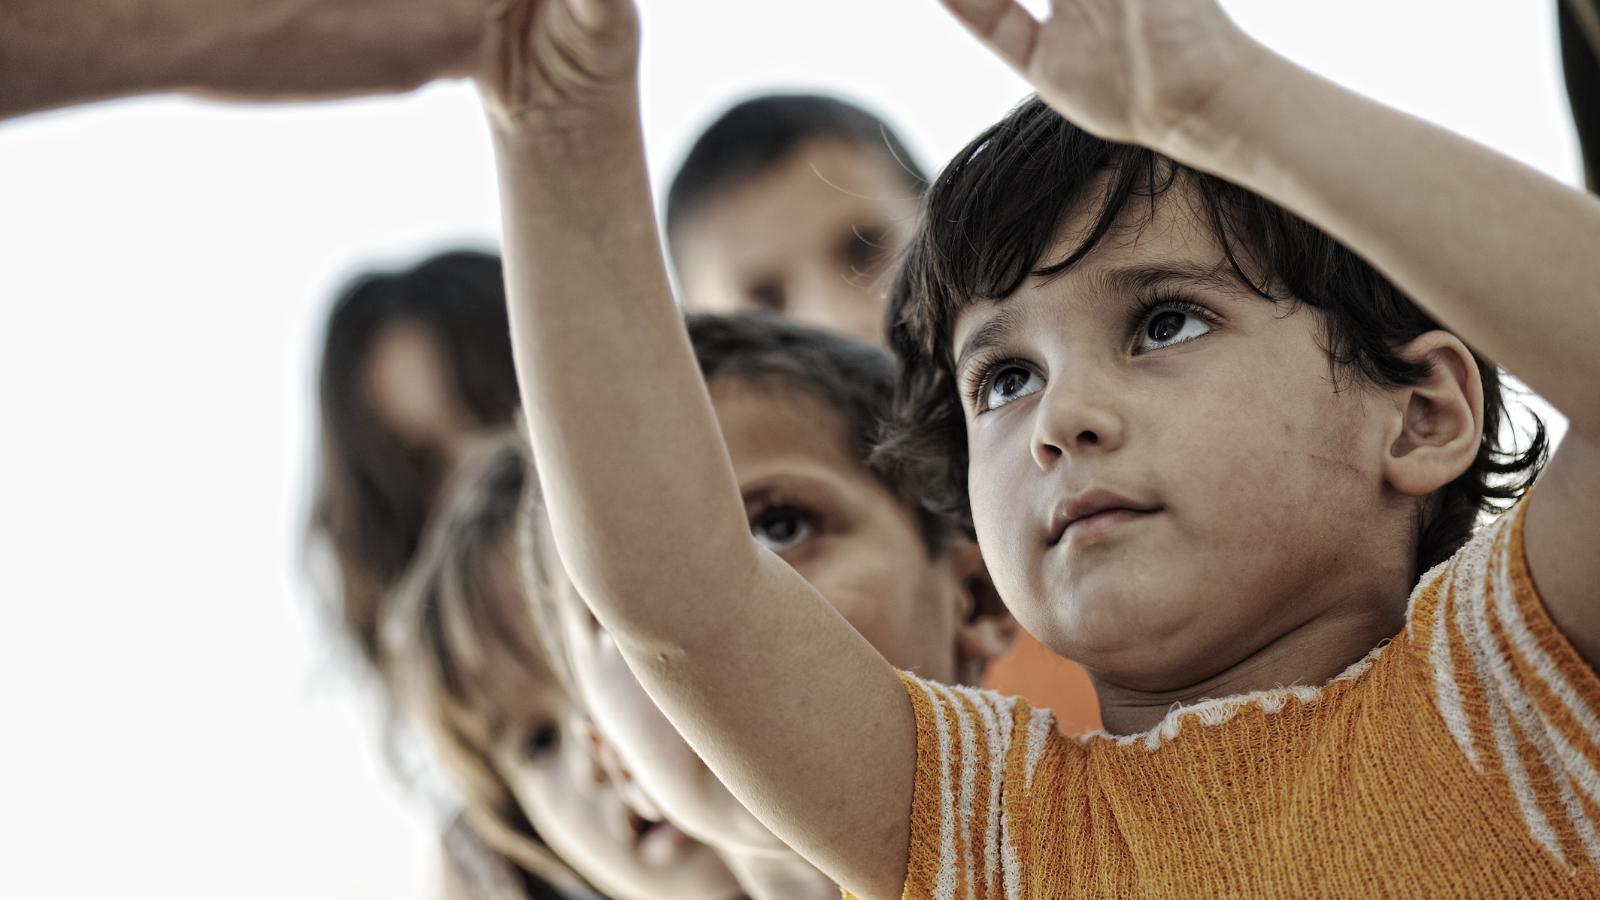 Child refugee